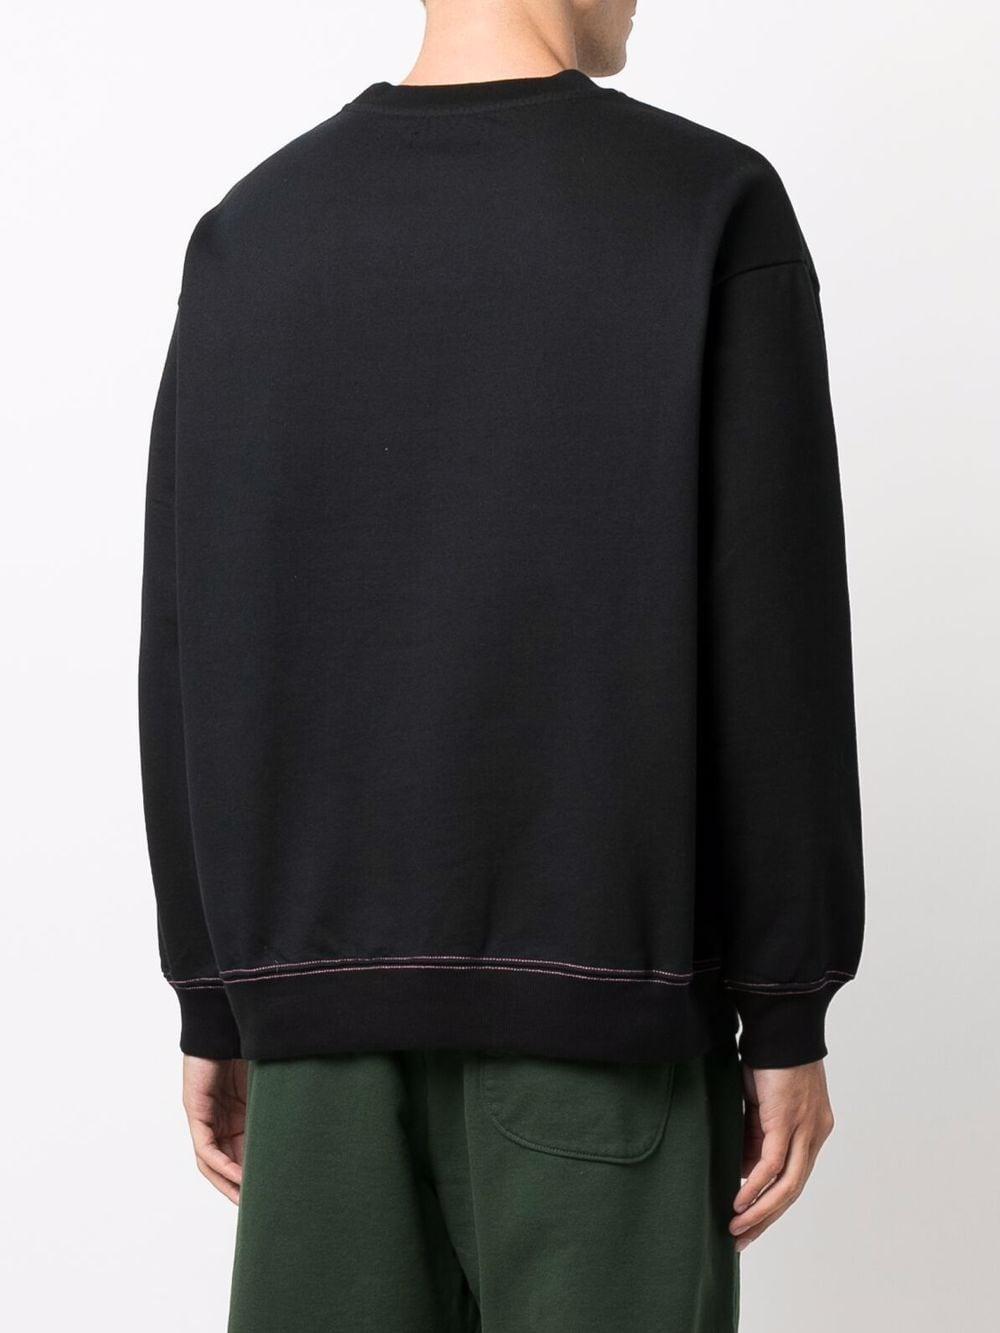 felpa con logo uomo nera in cotone RASSVET   Felpe   PACC9T0211